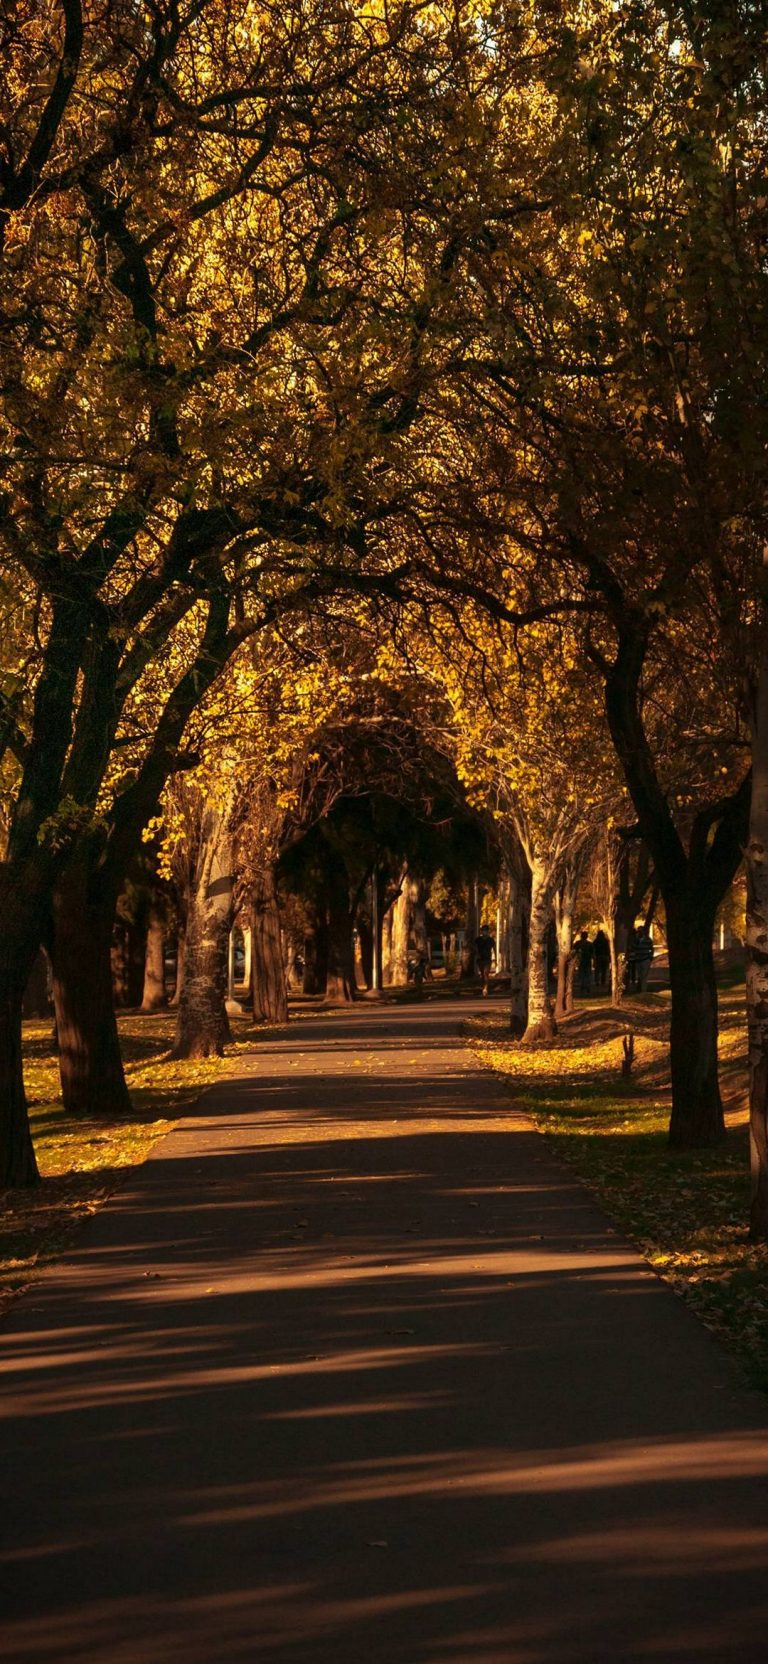 Autumn Phone Wallpaper 051 768x1664